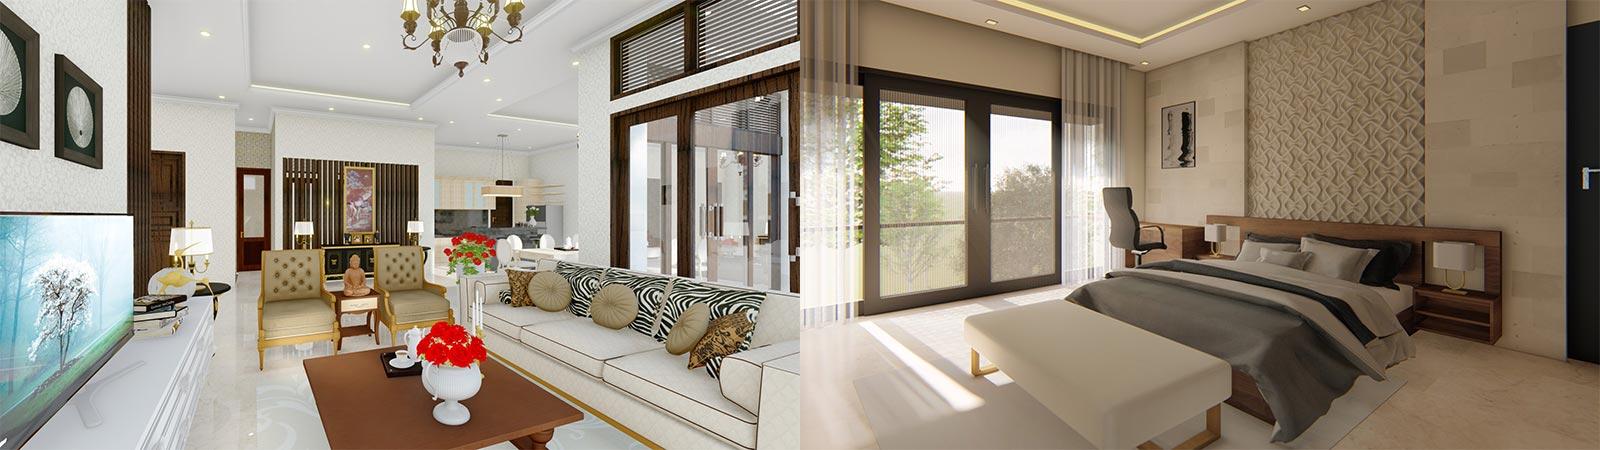 Jasa Arsitek Gambar Visual 3D Interior